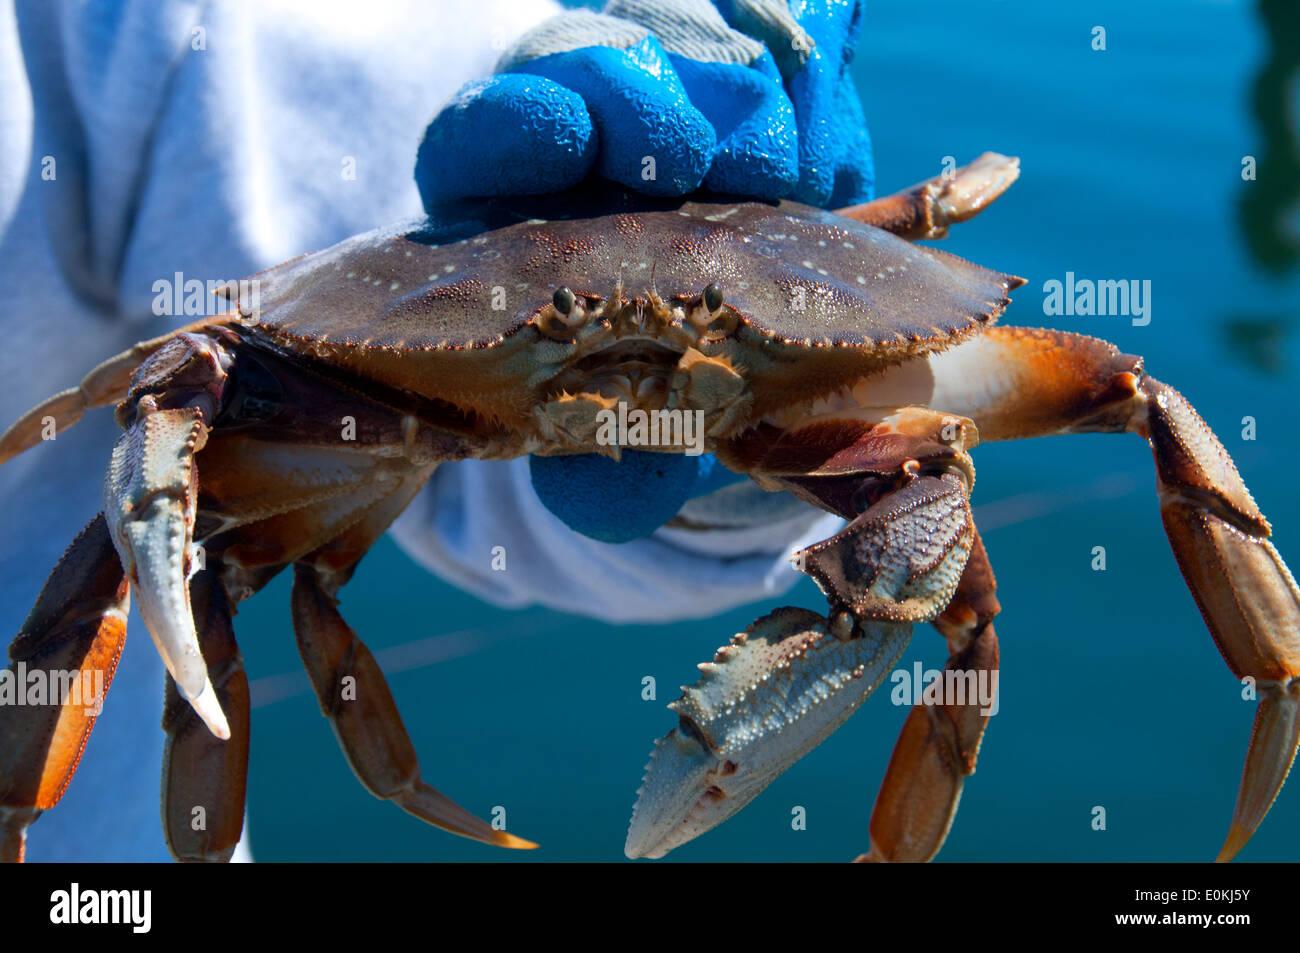 Crab charleston oregon stock photo royalty free image for Crab fishing oregon